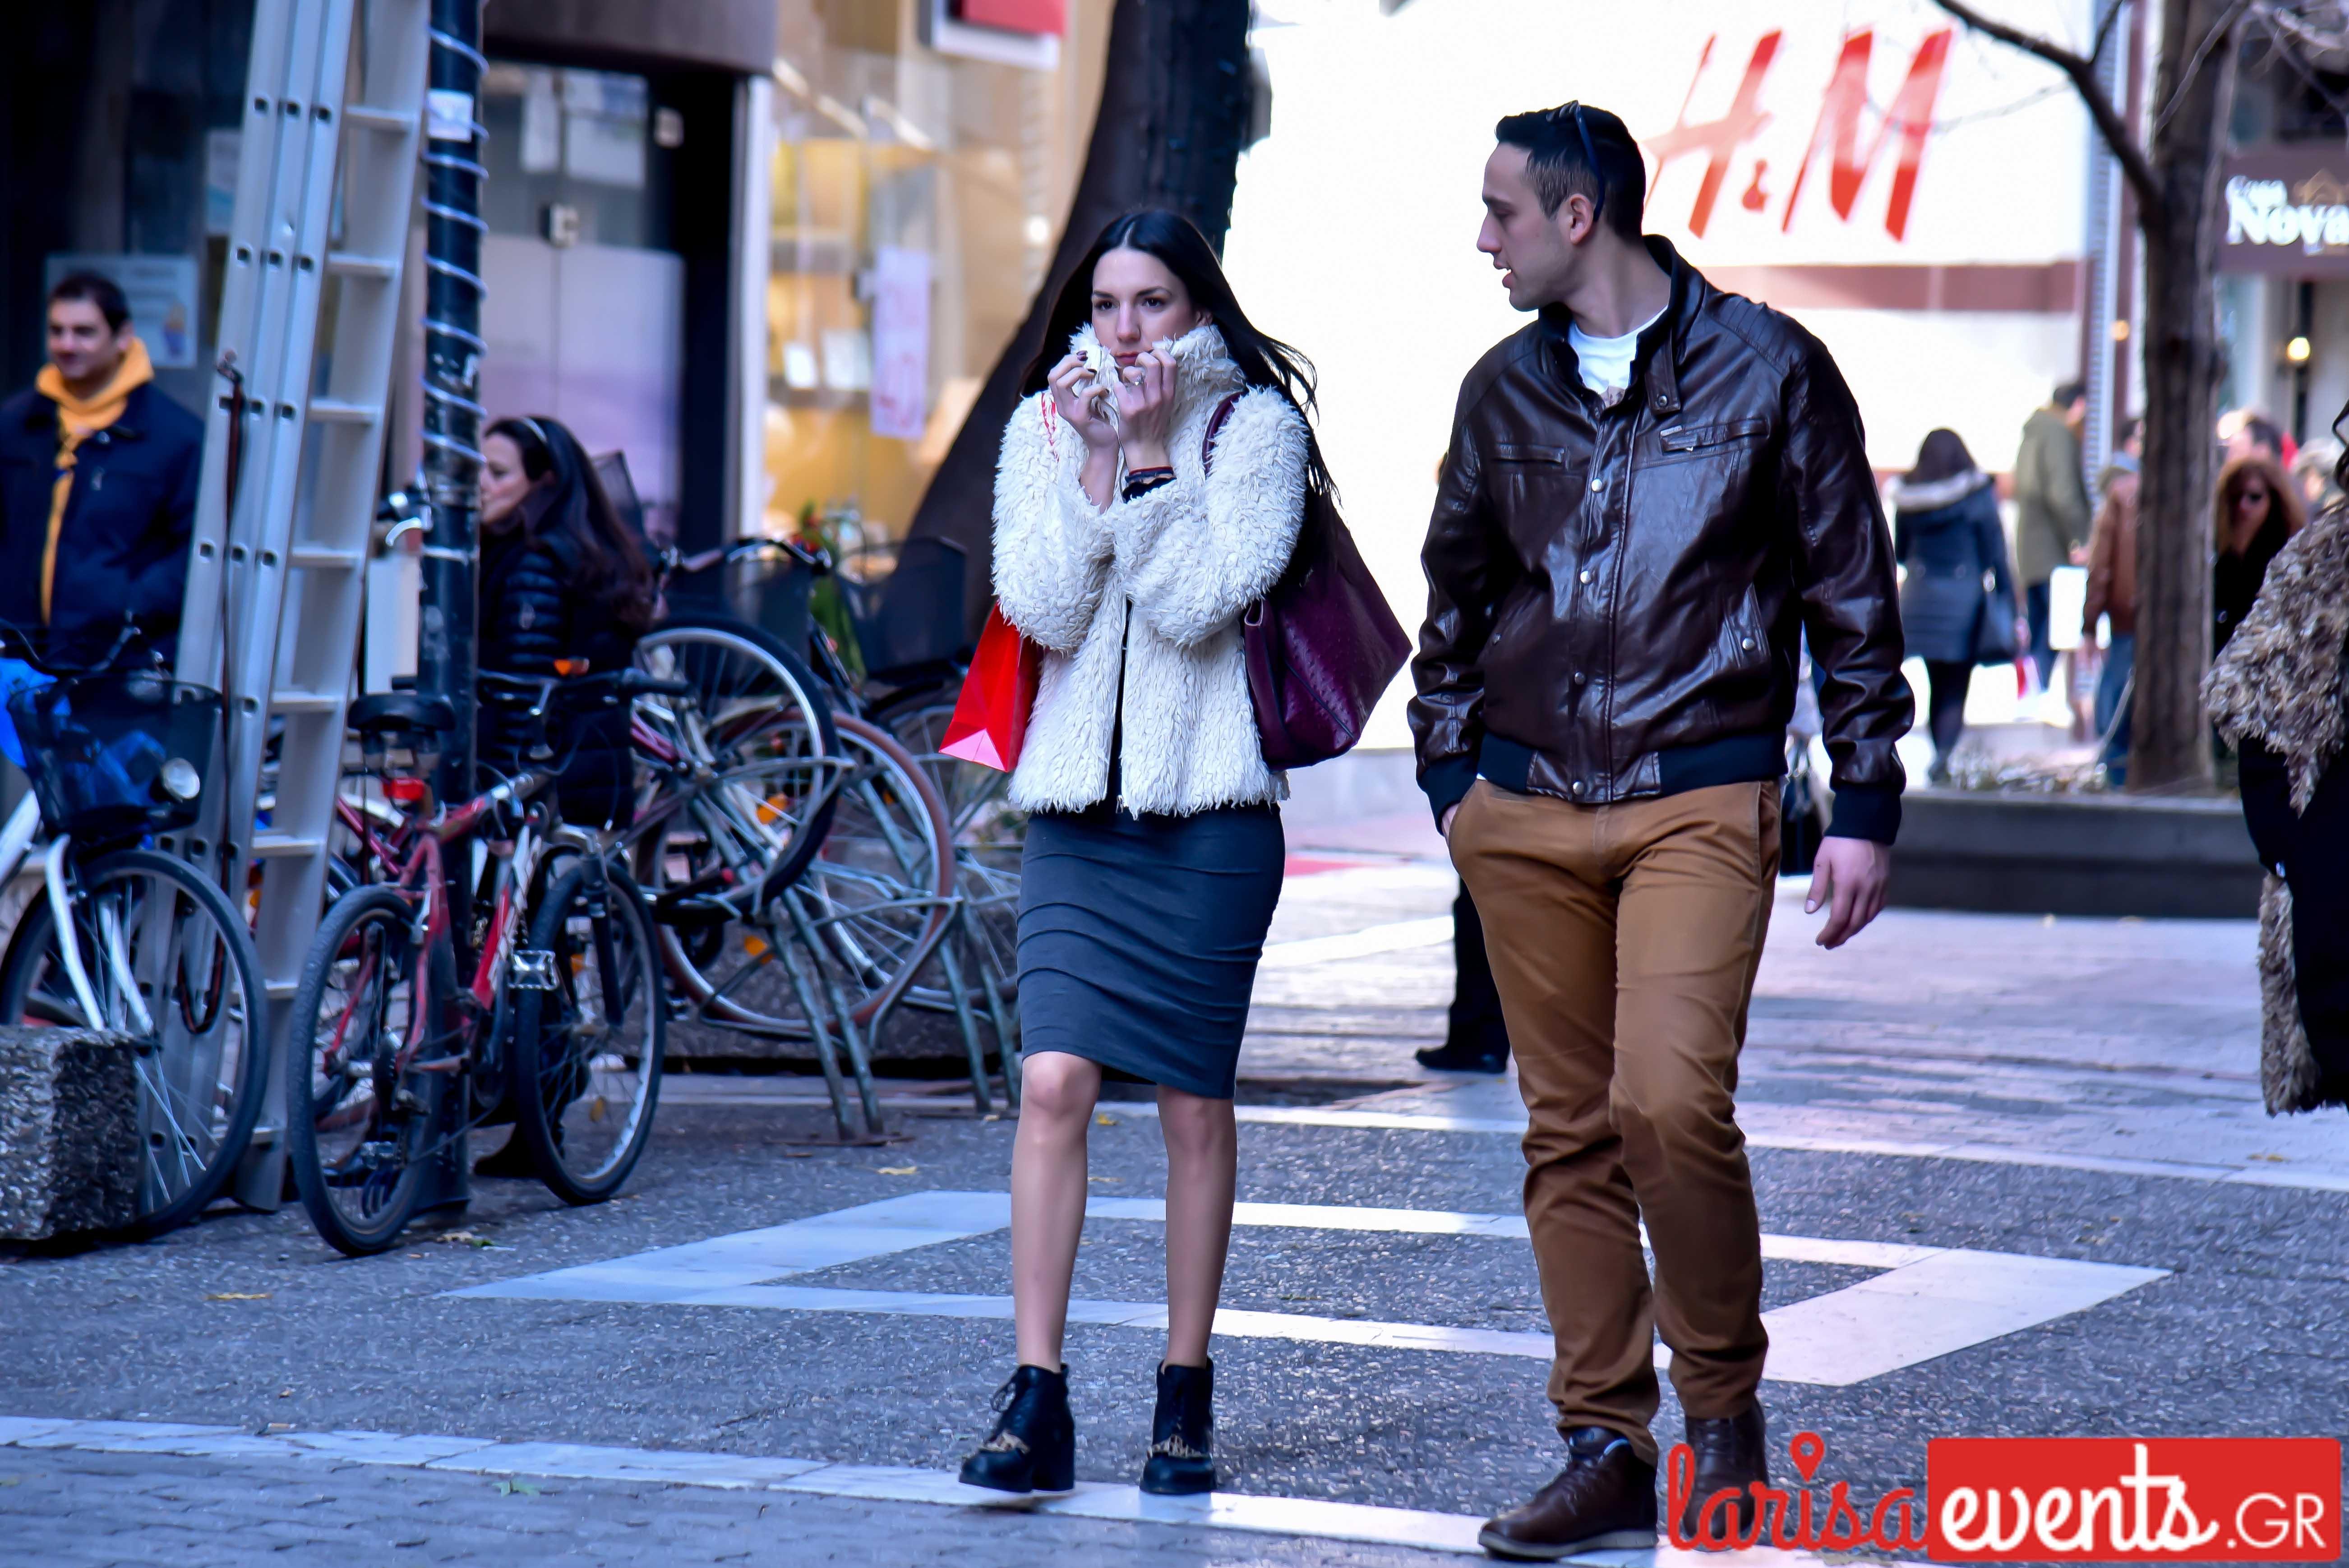 LAZ 7378 - Λάρισα's Street Style | Οι γυναίκες της πόλης σε street style clicks!